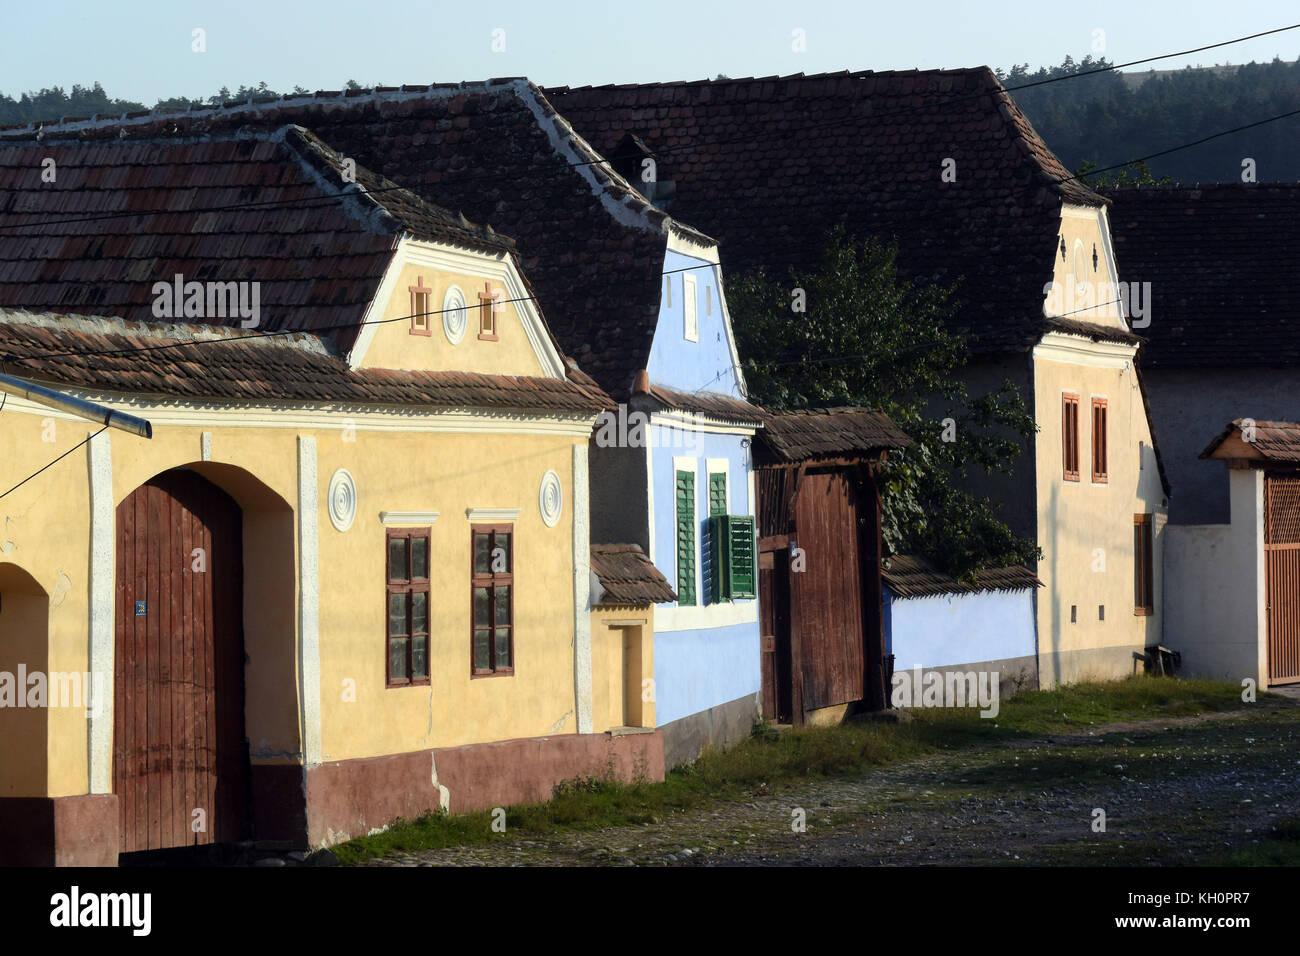 Transylvanian houses stock photos transylvanian houses stock images alamy - Saxon style houses in transylvania ...